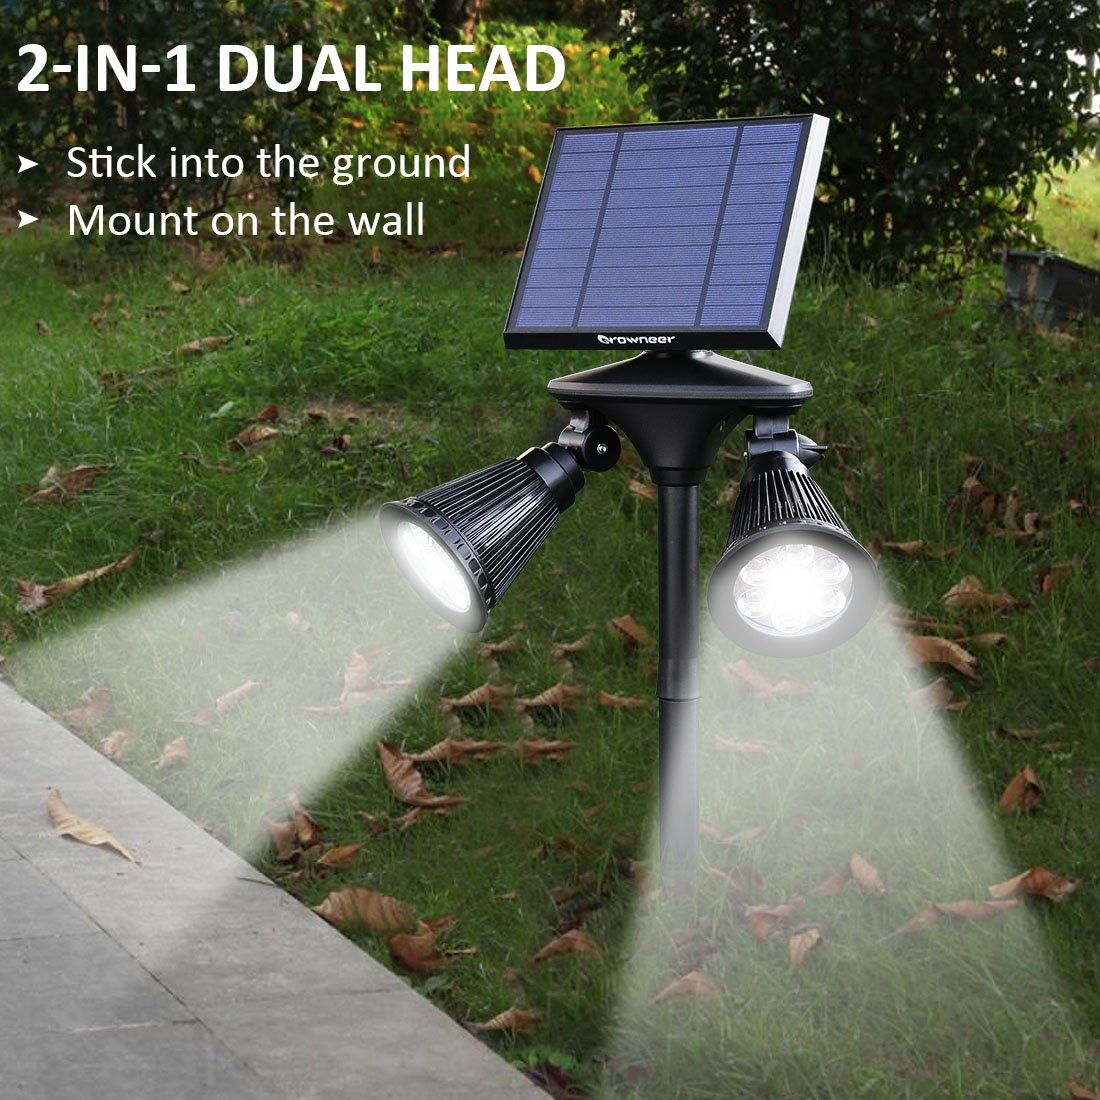 Solar Spotlights 2-in-1 Dual Head Outdoor 12 LED Landscape Lights, 360 Degree Rotatable Adjustable Solar Wall Light Security Lighting Dark Sensing Auto On/Off for Pathway Yard Garden Driveway Pool